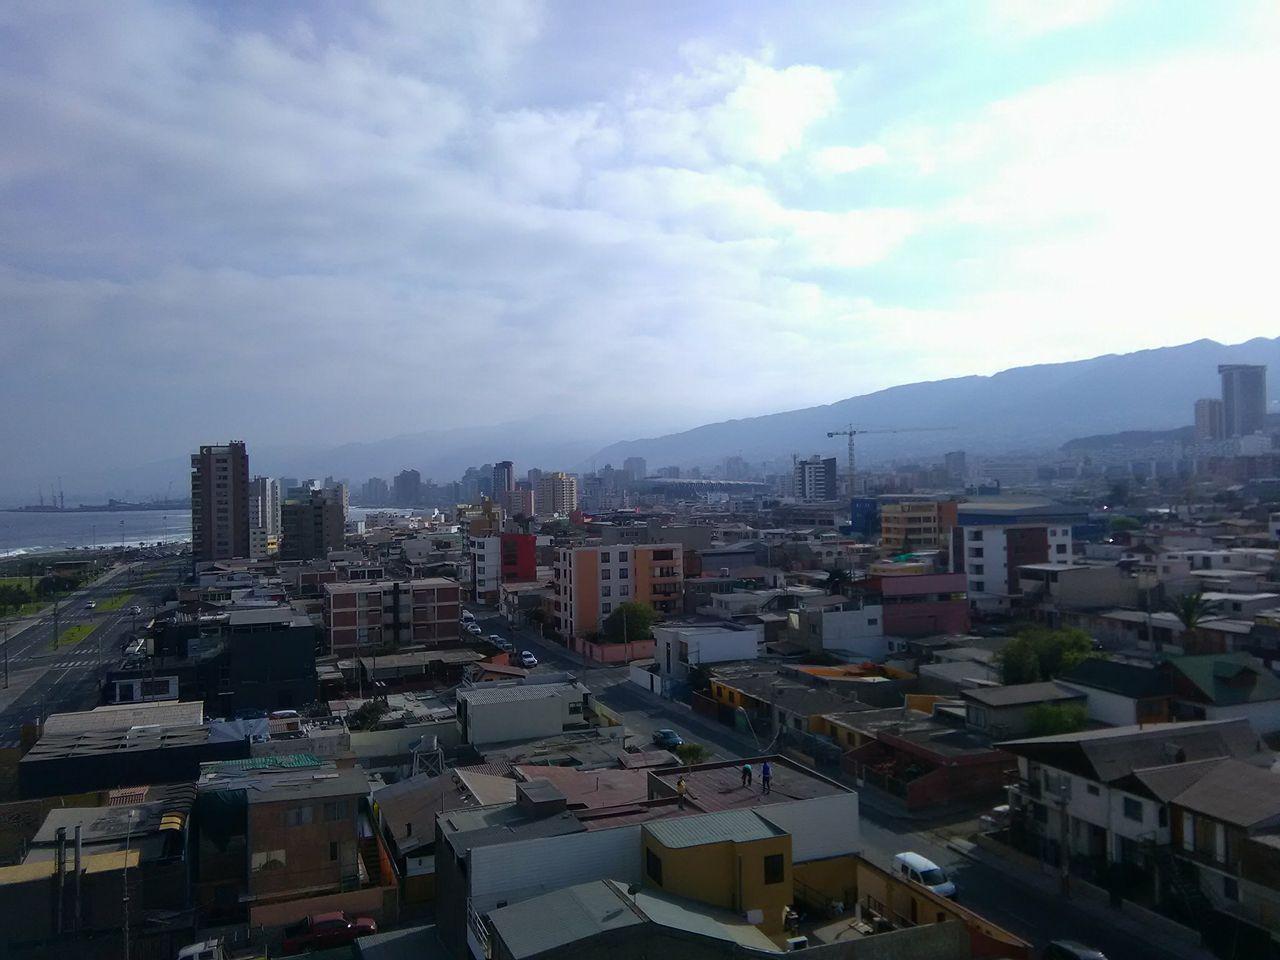 (2) Paisaje urbano de Antofagasta © Sebastián Rodríguez L. para  LOFscapes.